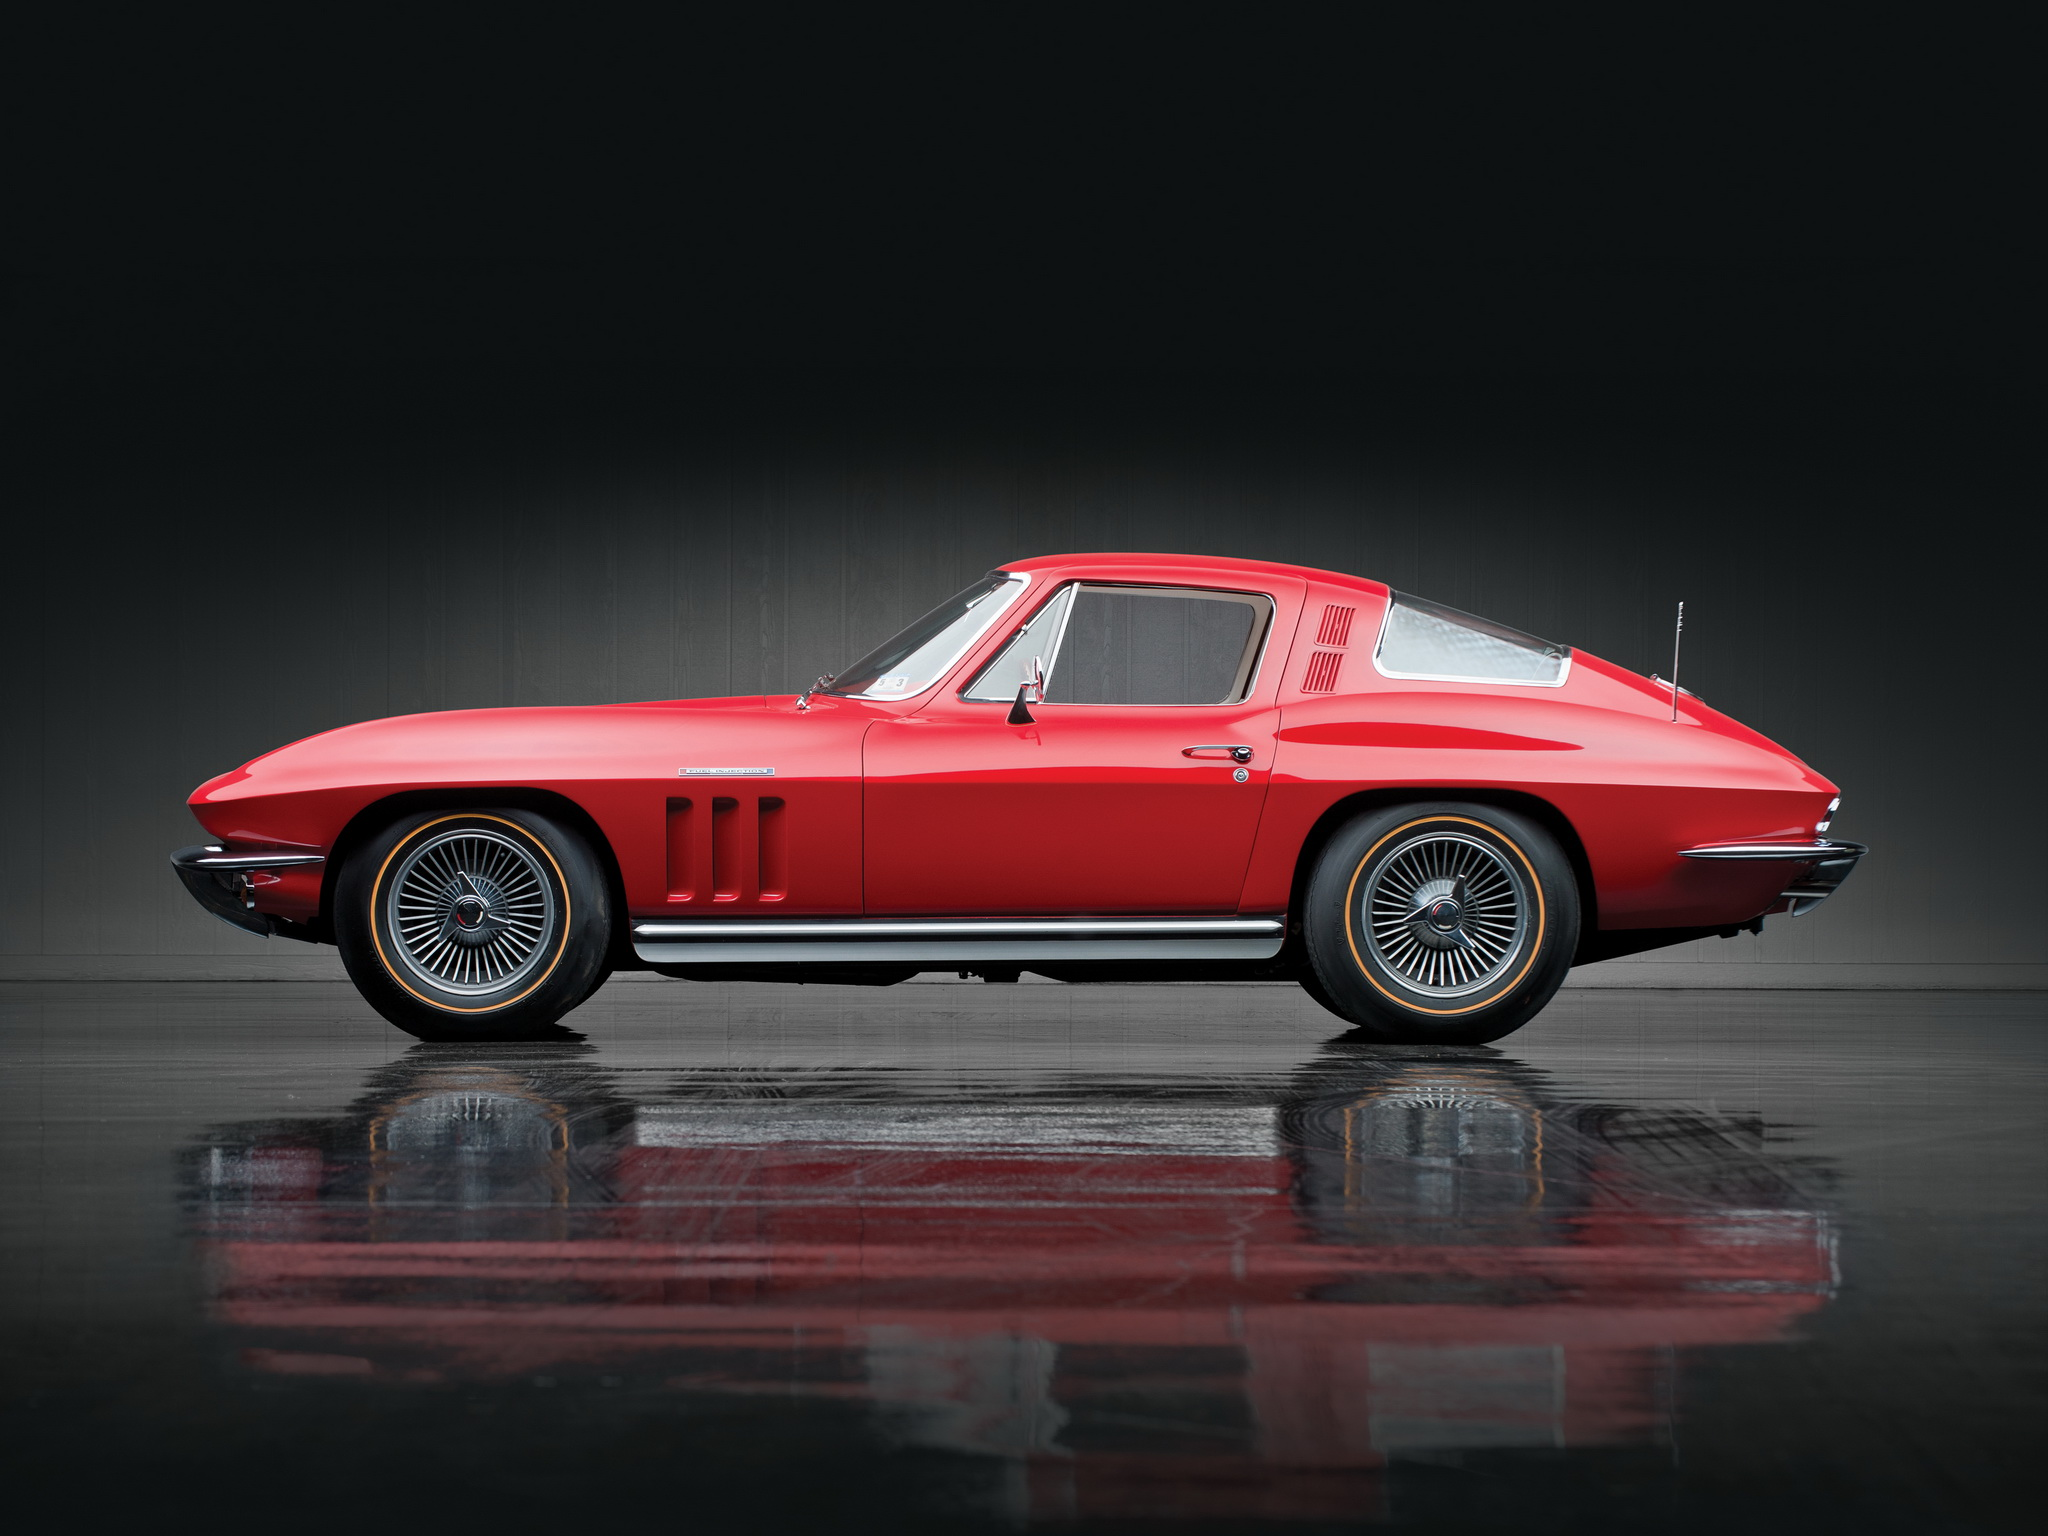 1965 corvette wallpaper - photo #29